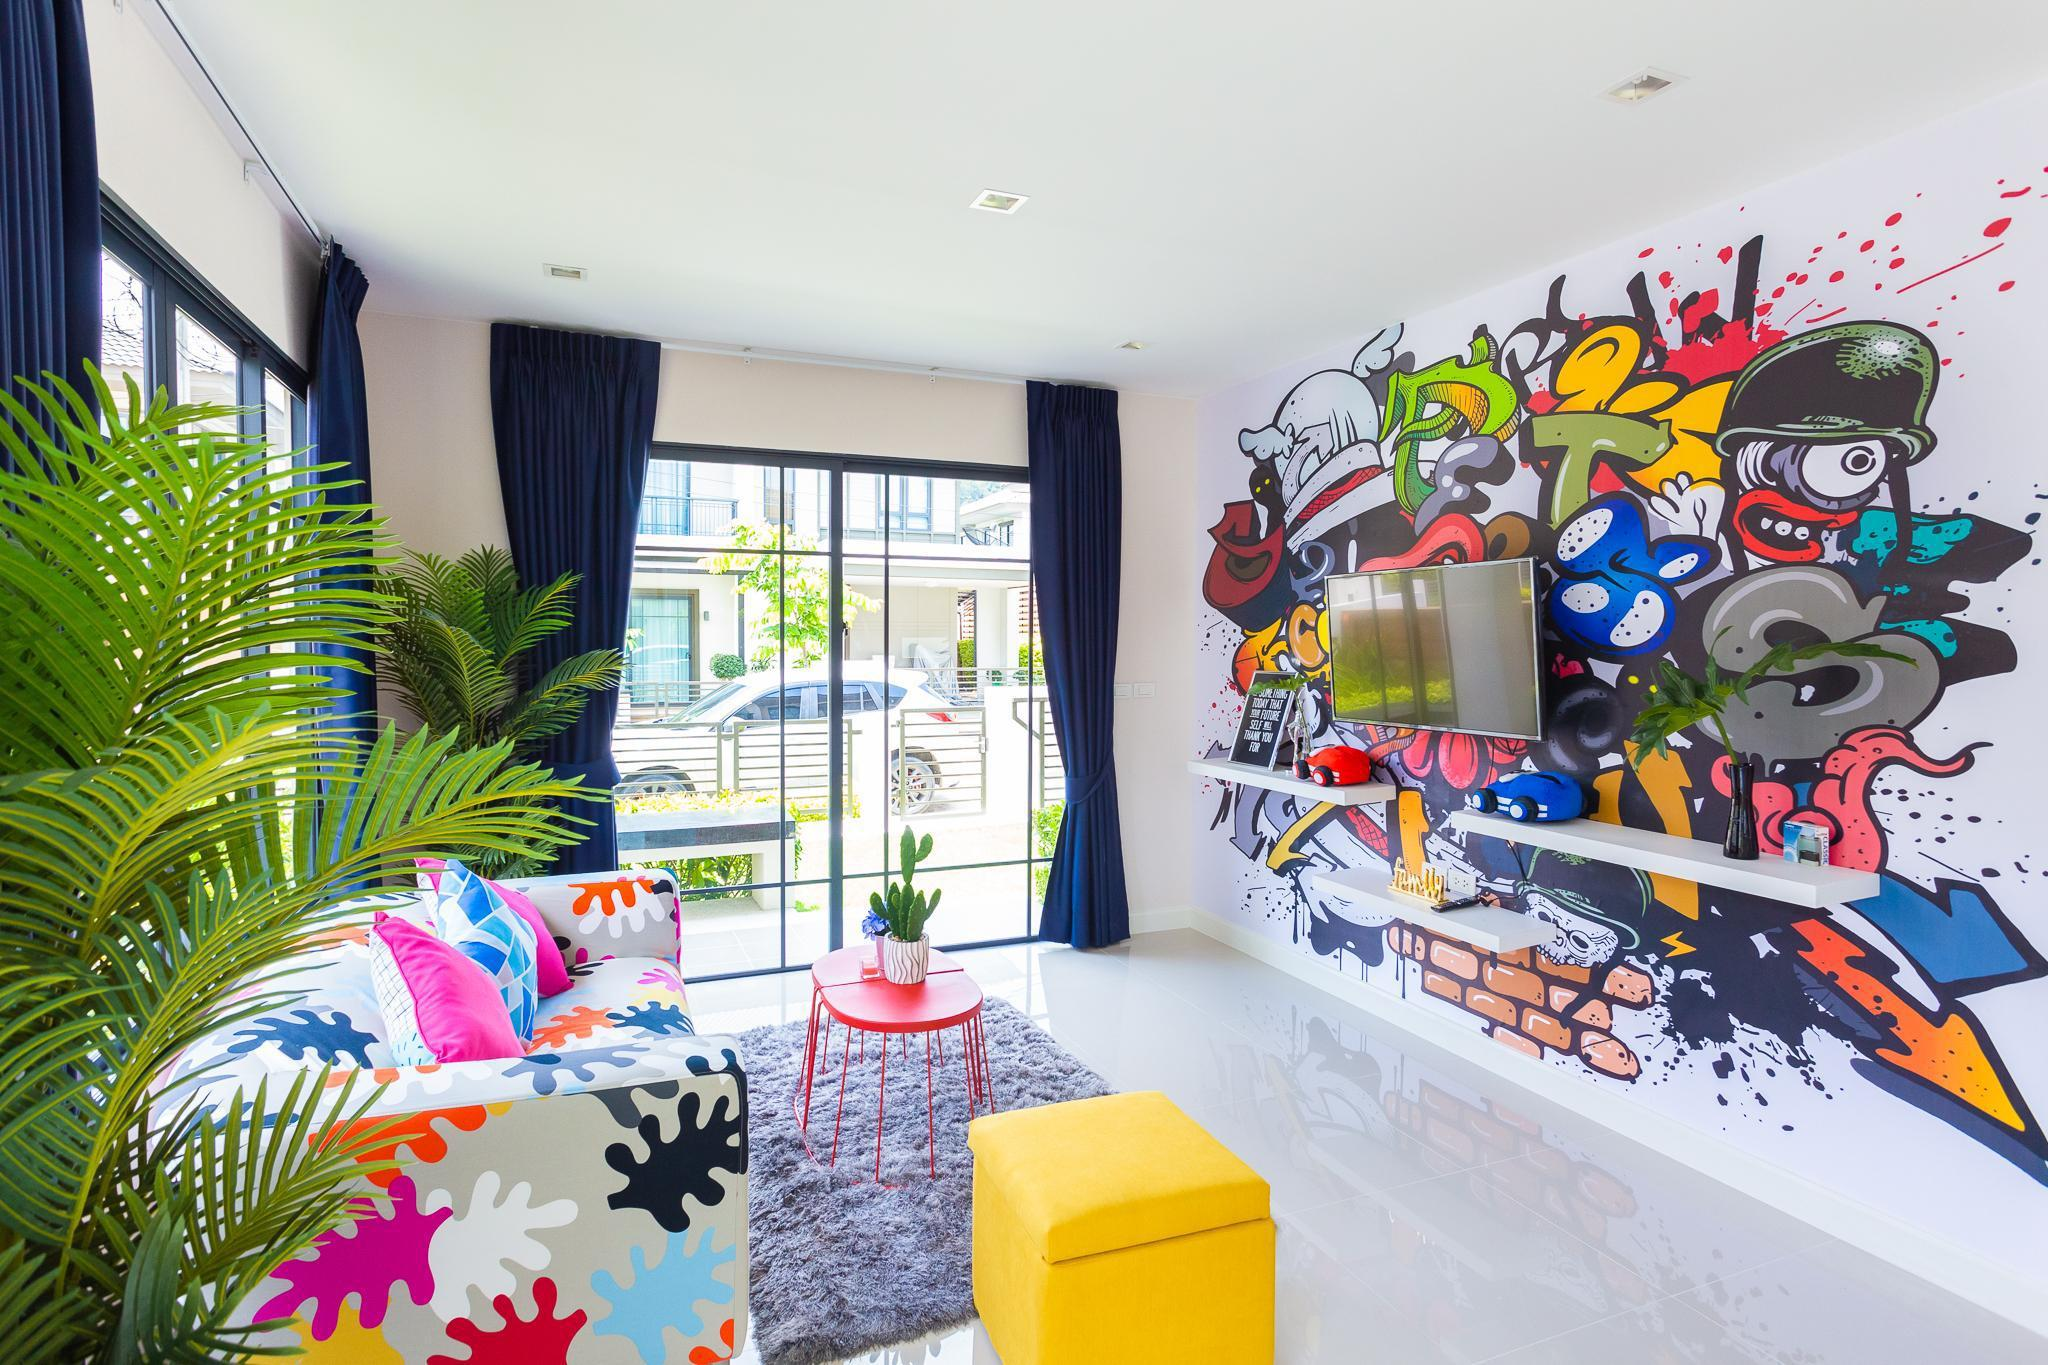 ColorChic Home - 3 BR ModernStyle, Large Pool บ้านเดี่ยว 3 ห้องนอน 3 ห้องน้ำส่วนตัว ขนาด 160 ตร.ม. – ป่าคลอก